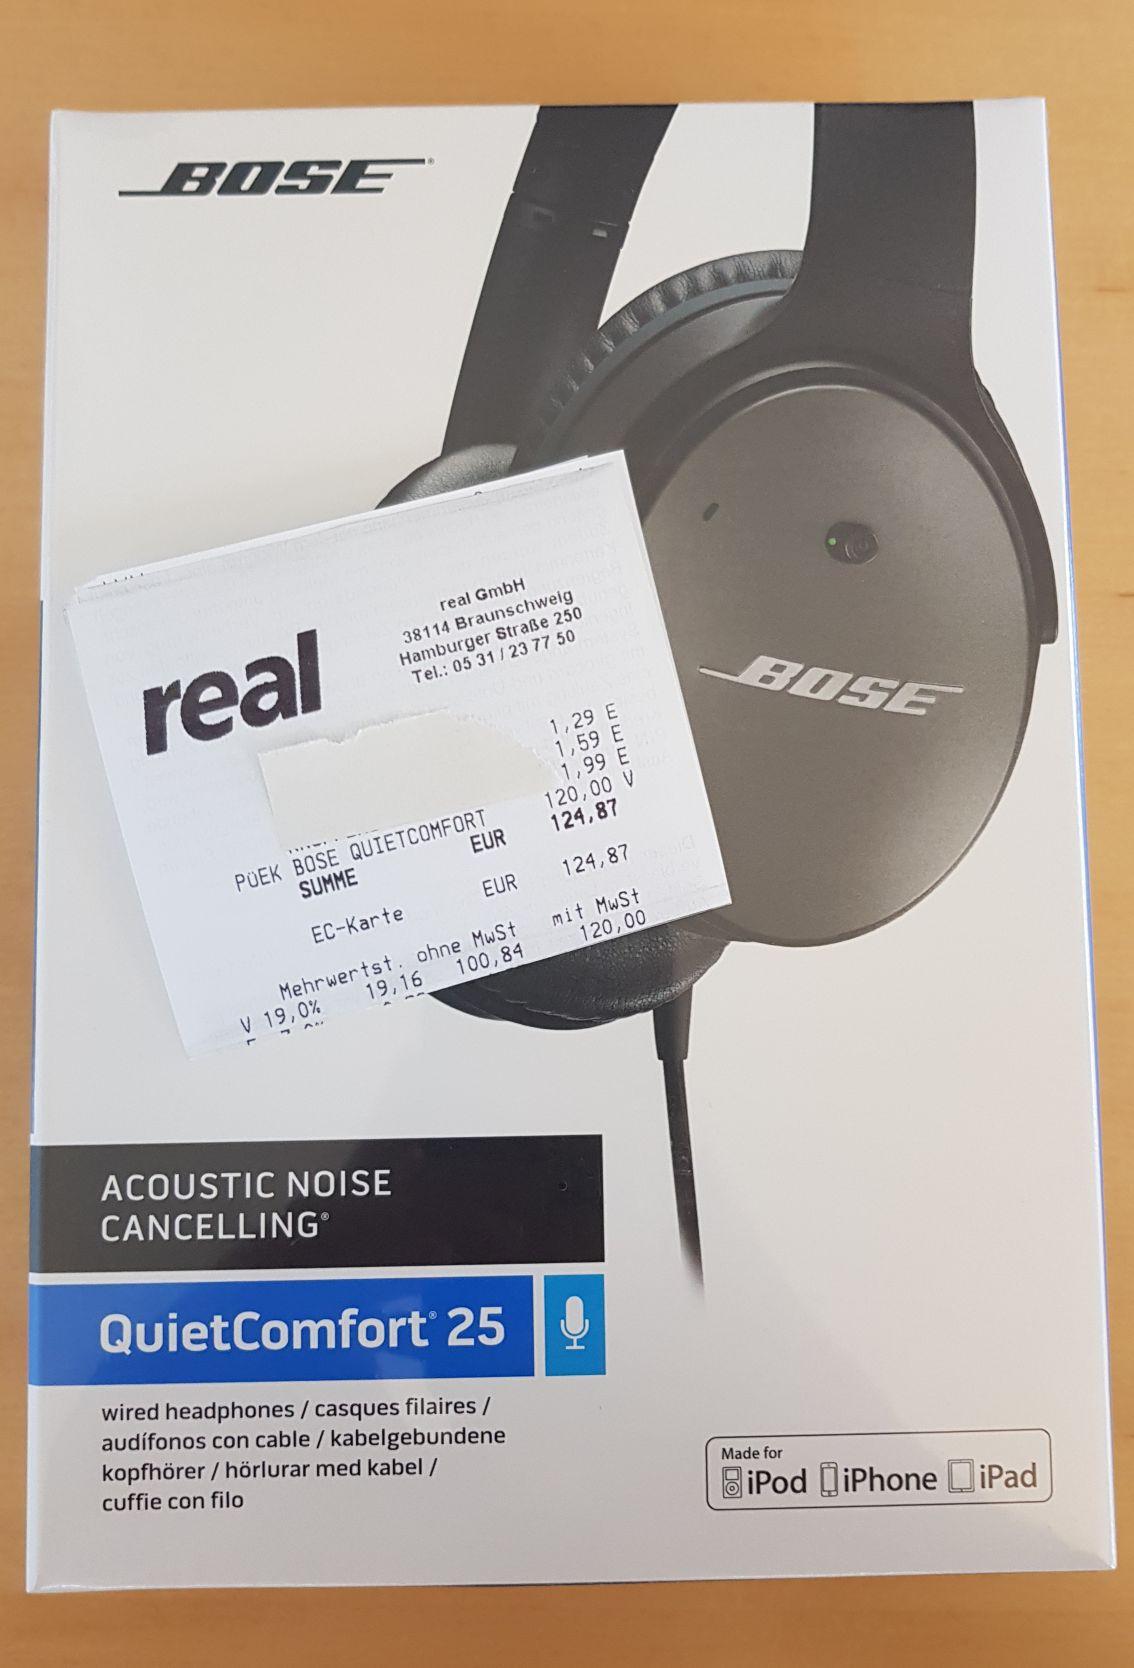 BOSE QuietComfort 25 (Apple Variante) Over Ear Kopfhörer für nur 120,-€ [real Braunschweig Hamb. Str., lokal]